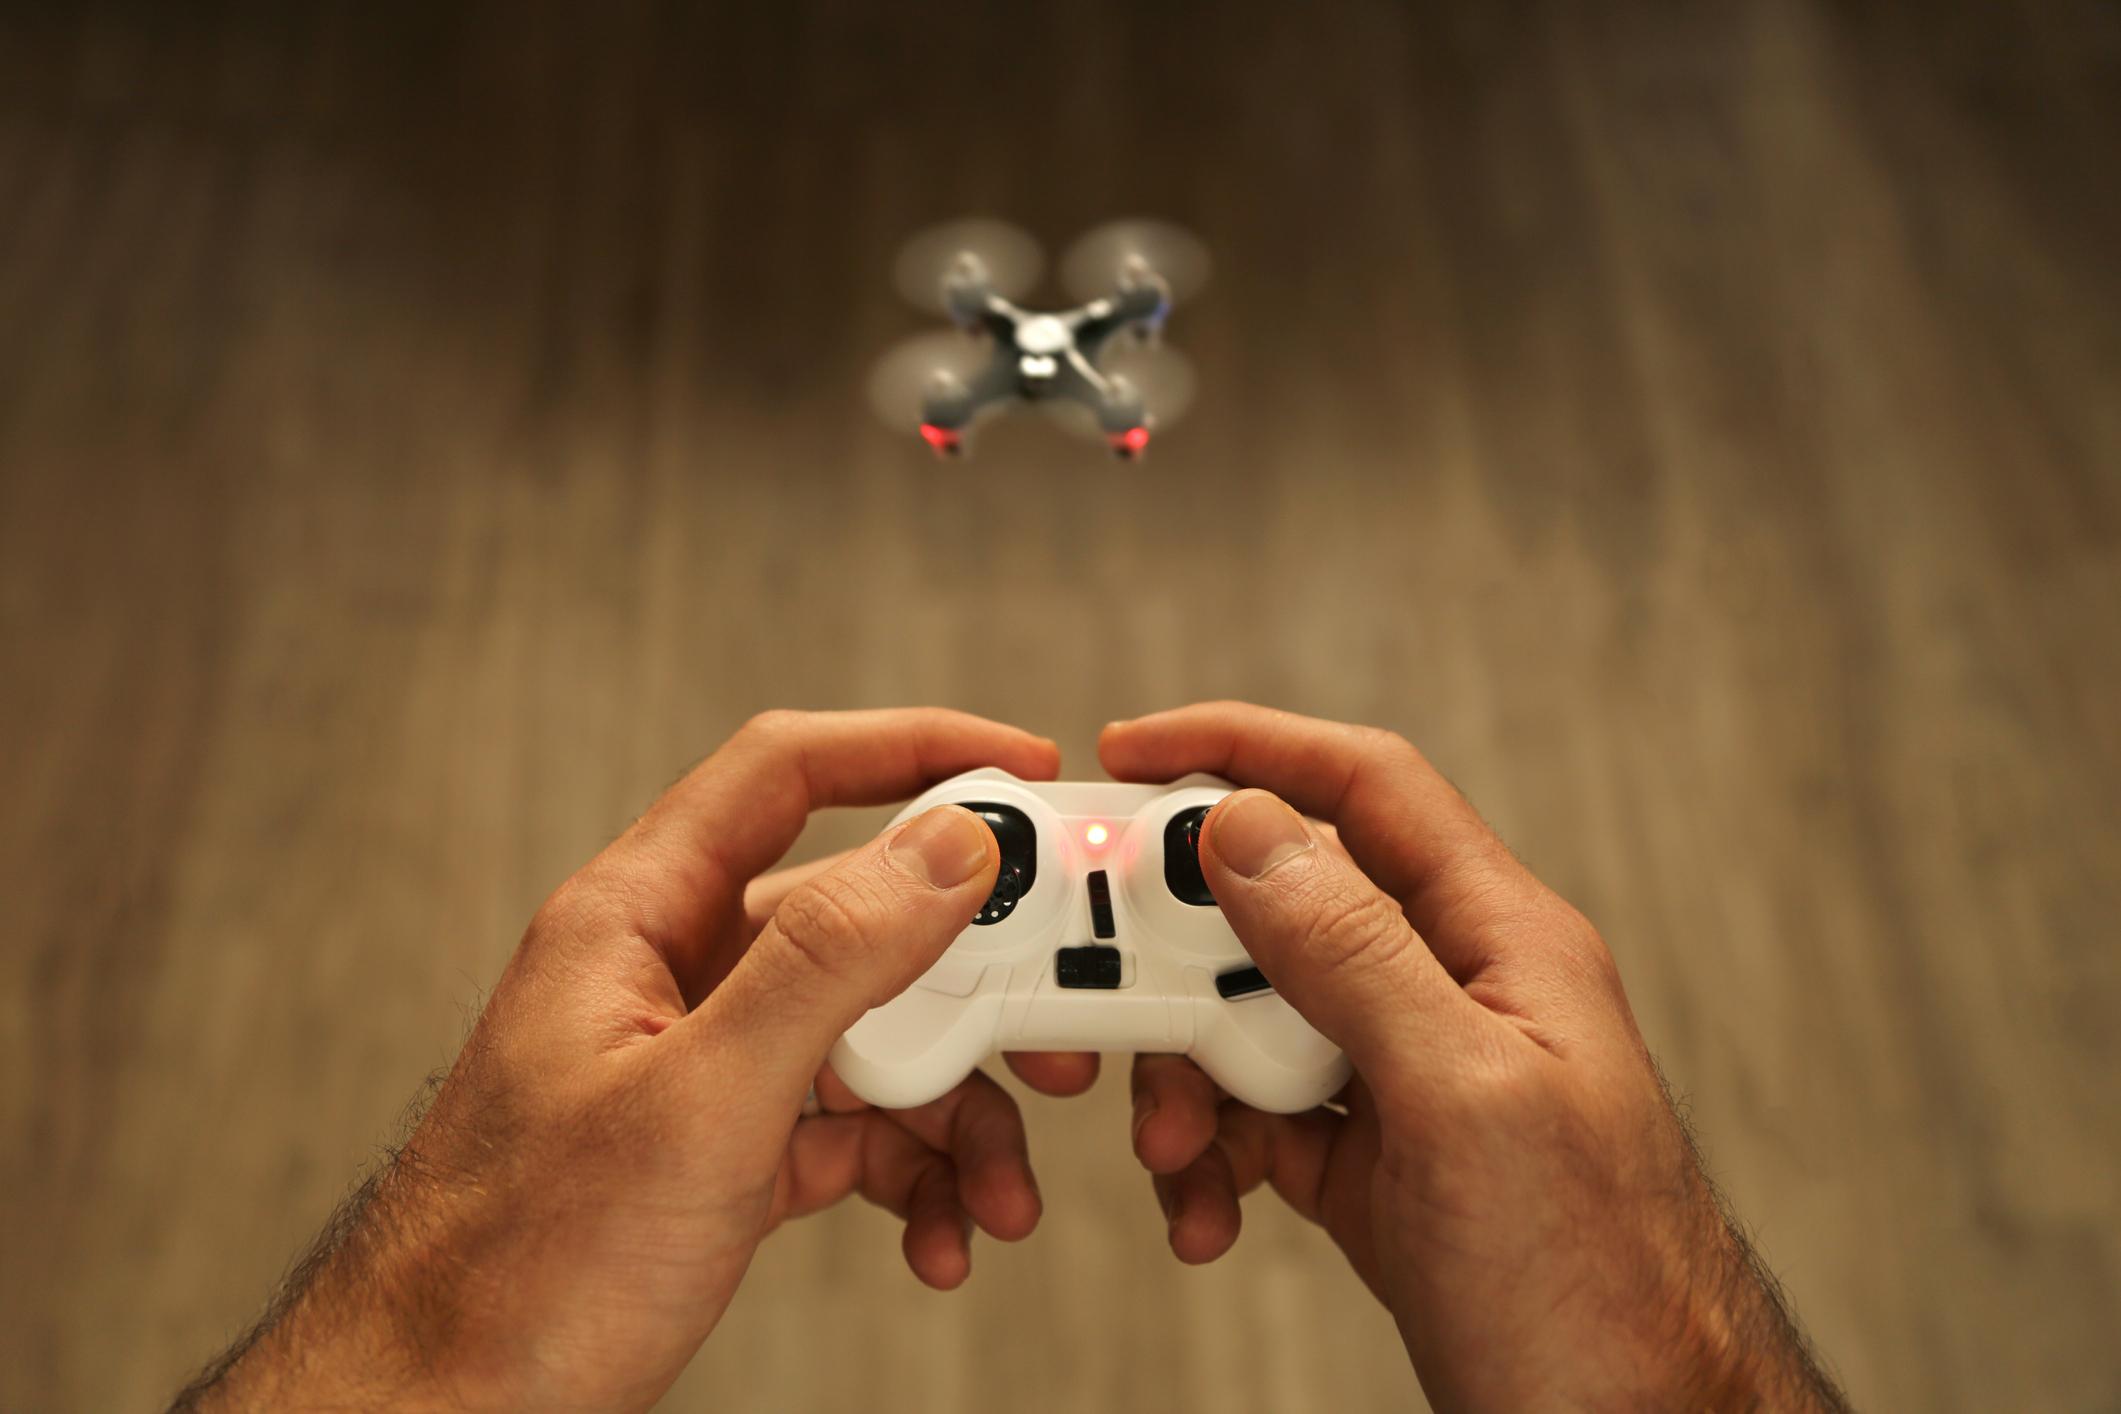 Hacking microdrones